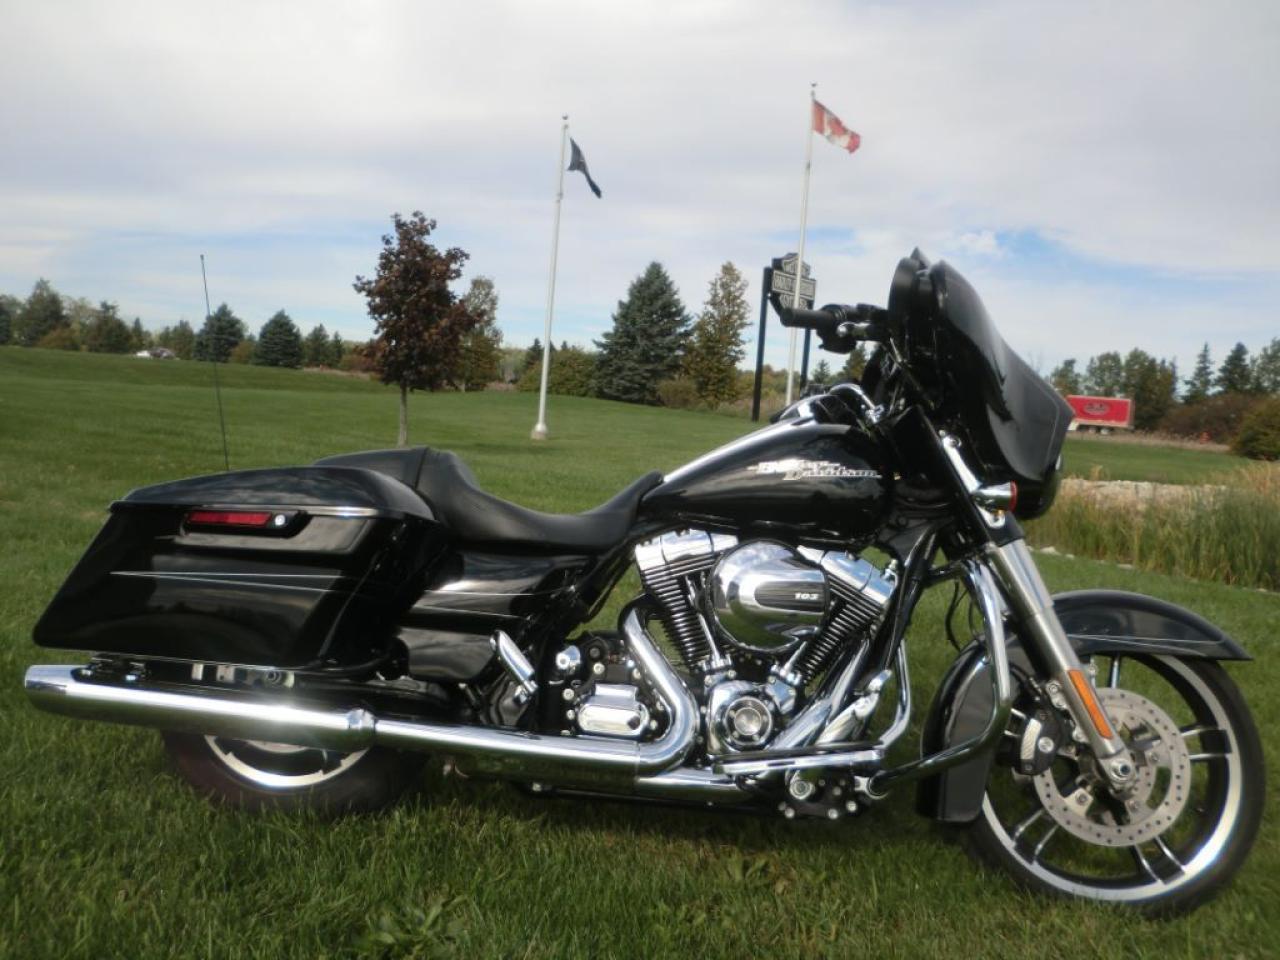 2015 Harley-Davidson Street Glide FLHXS Street Glide Special